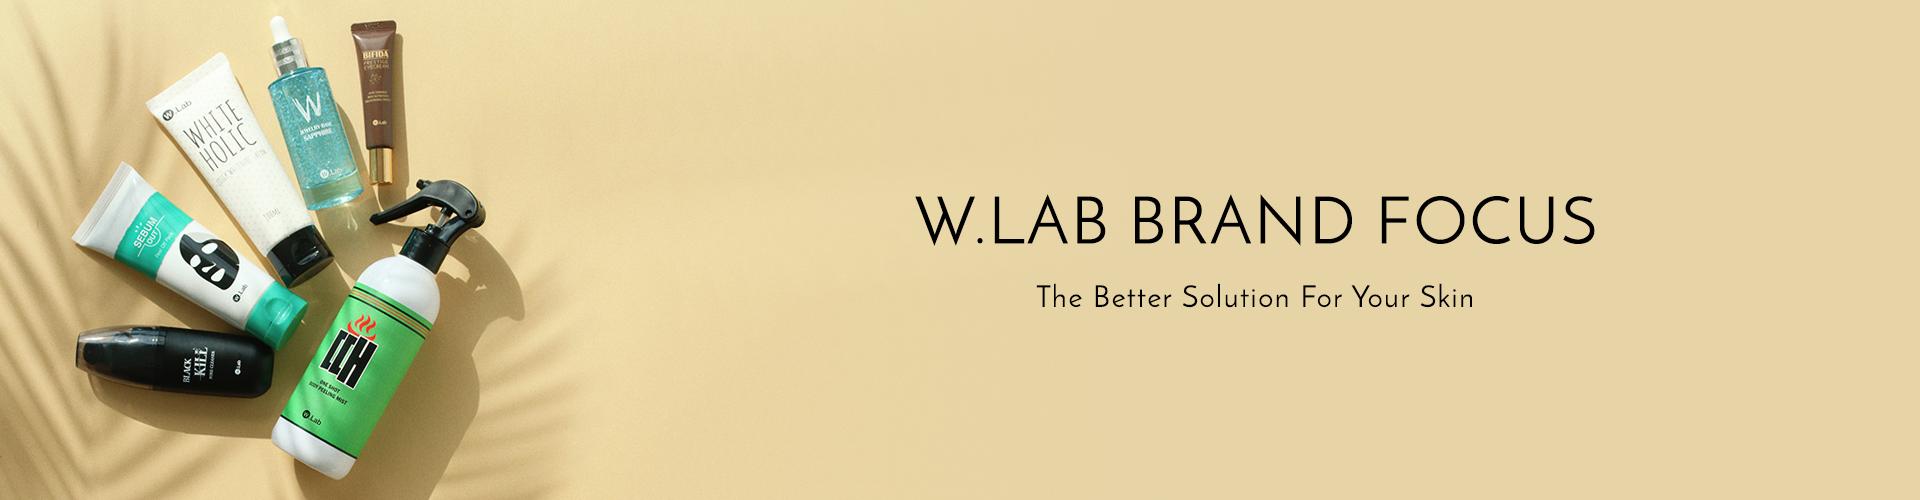 W.Lab